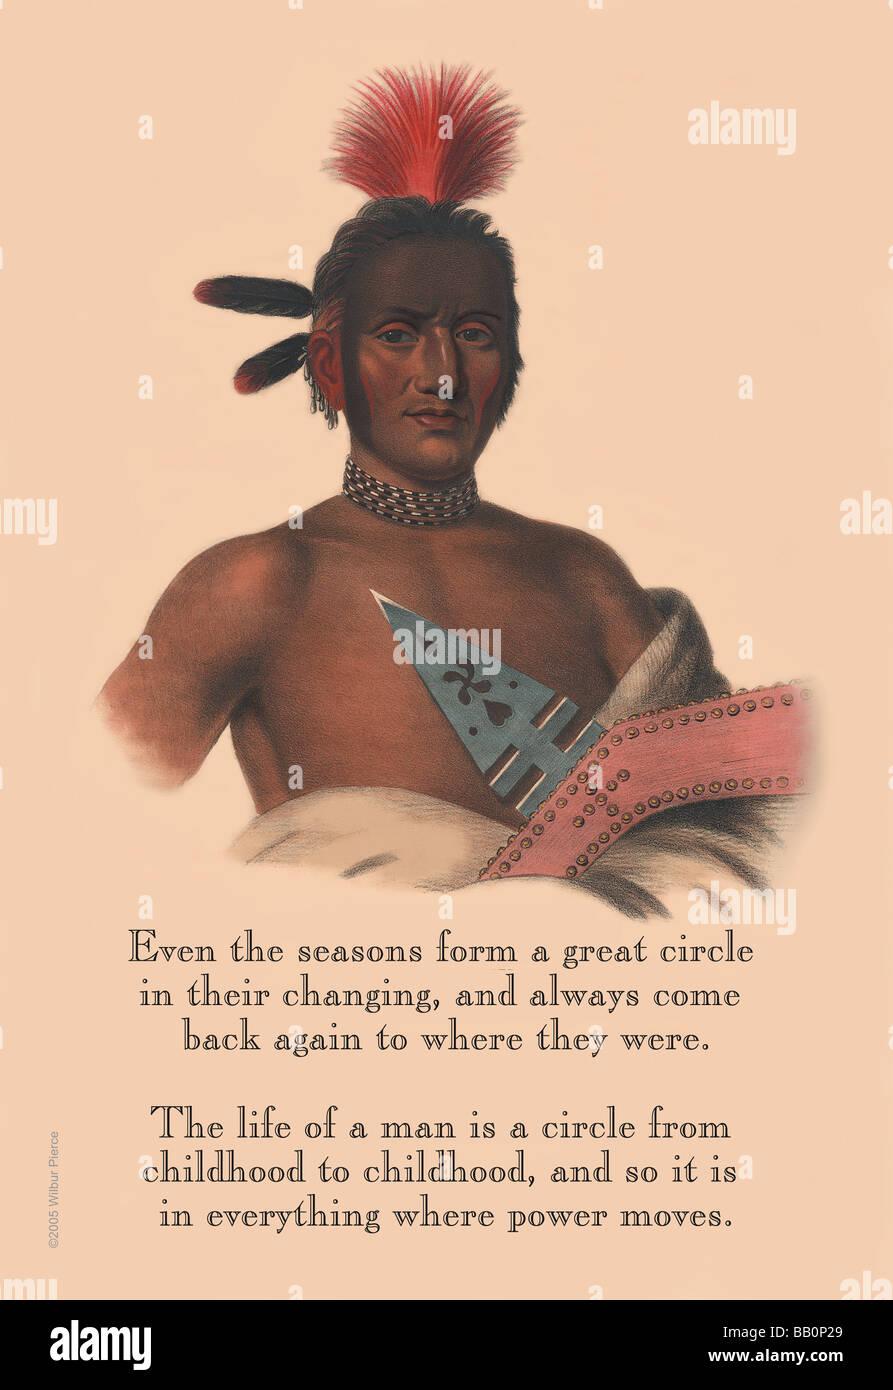 The Seasons Form a Circle - Stock Image